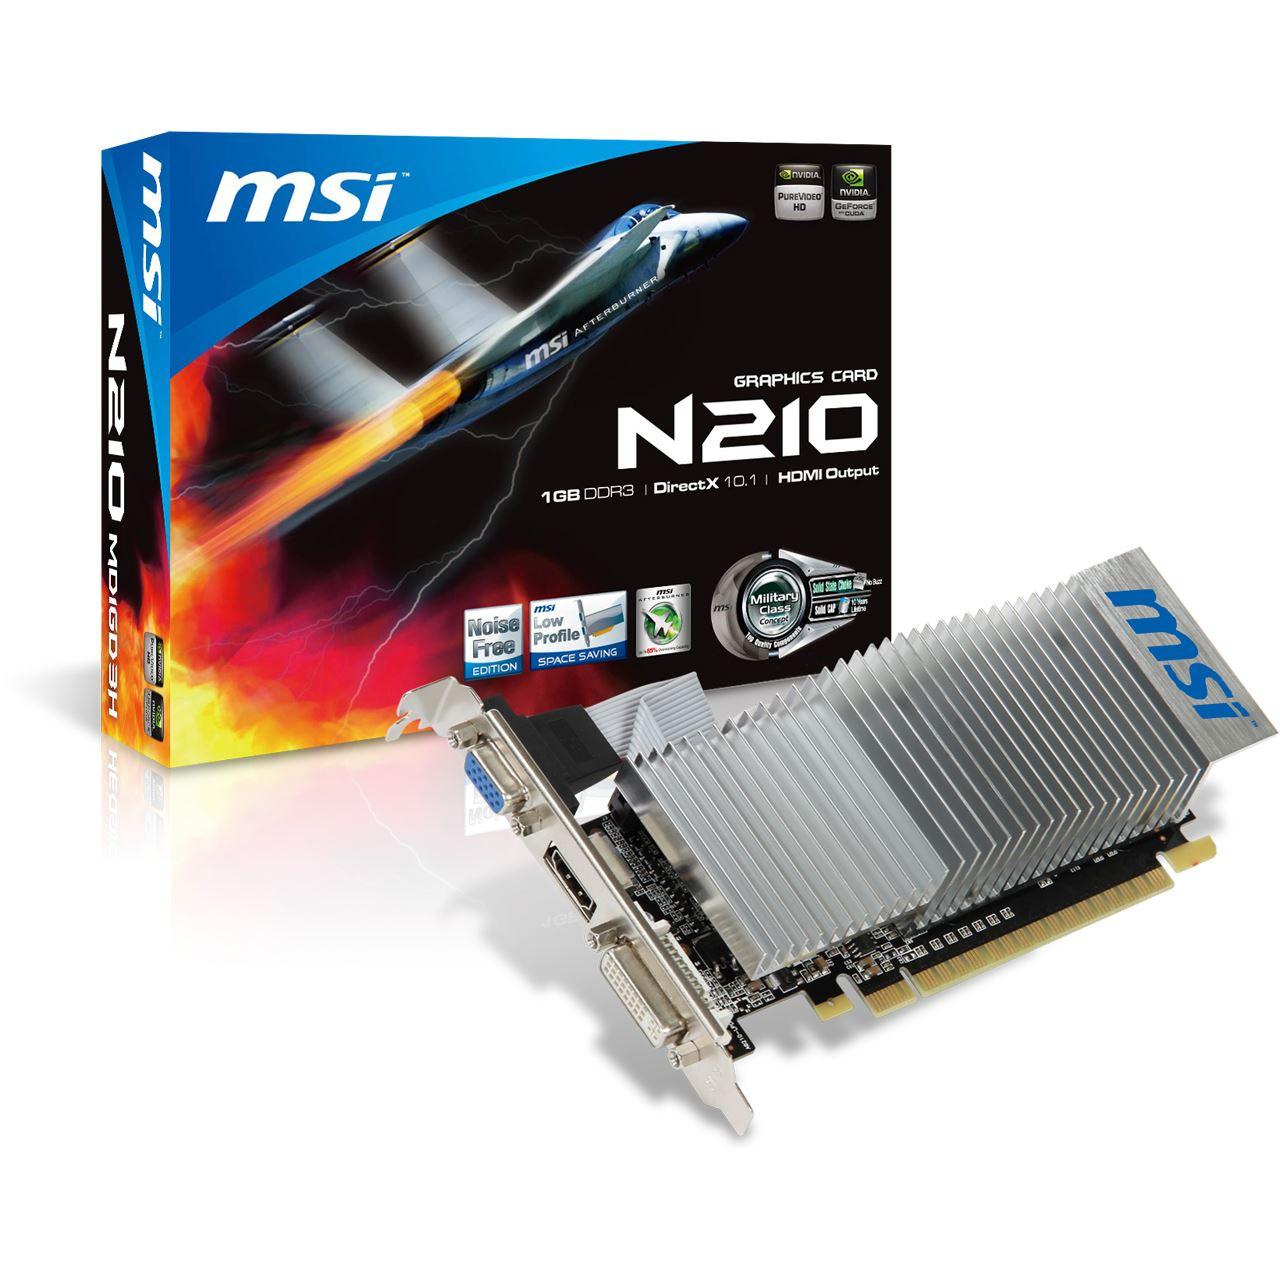 1GB MSI GeForce 210 Low Profile Passiv PCIe 2.0 x16 (Retail) - G 210 ...